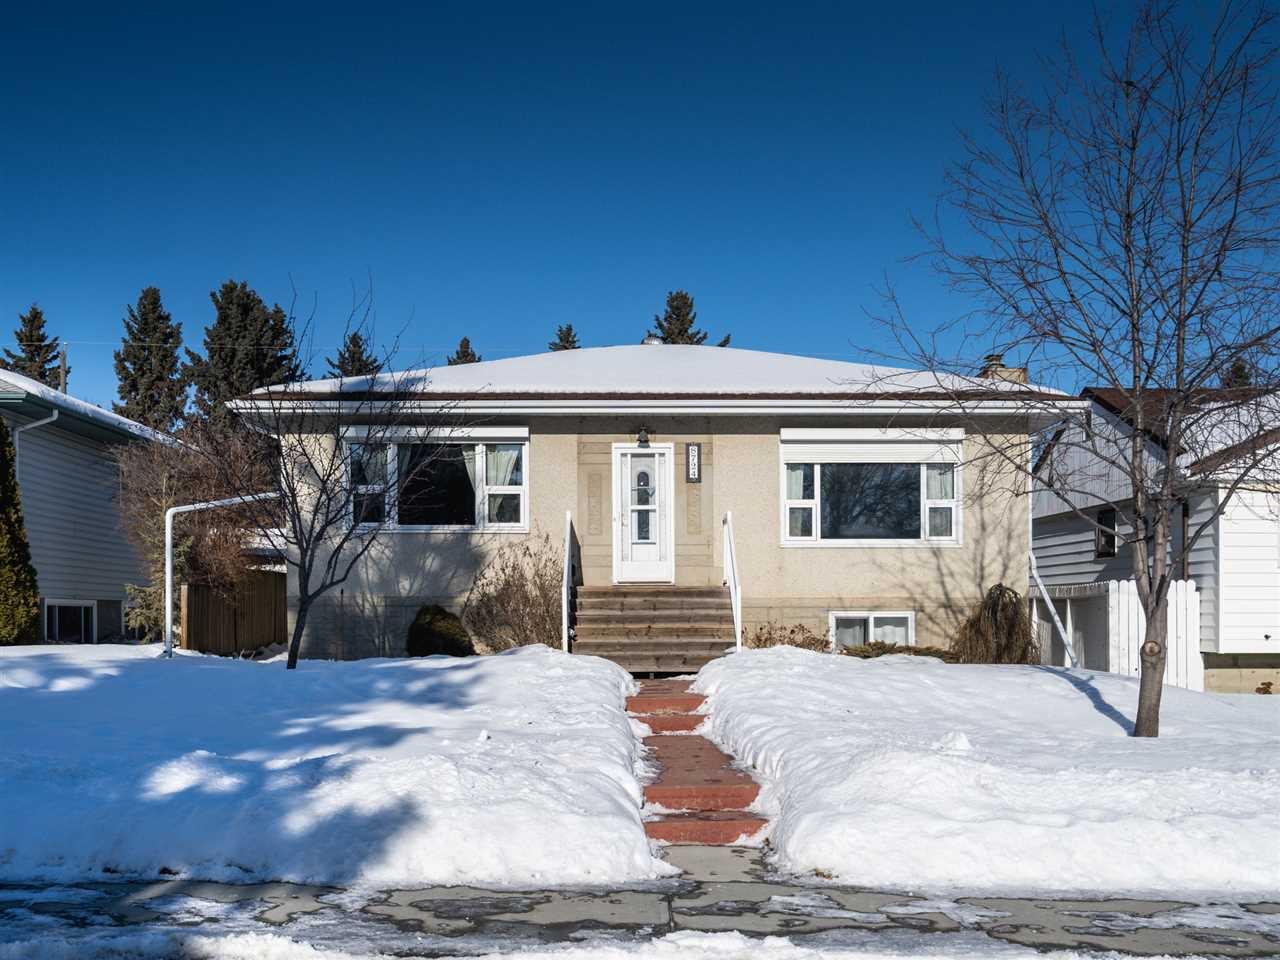 Main Photo: 8724 89 Avenue in Edmonton: Zone 18 House for sale : MLS®# E4187395